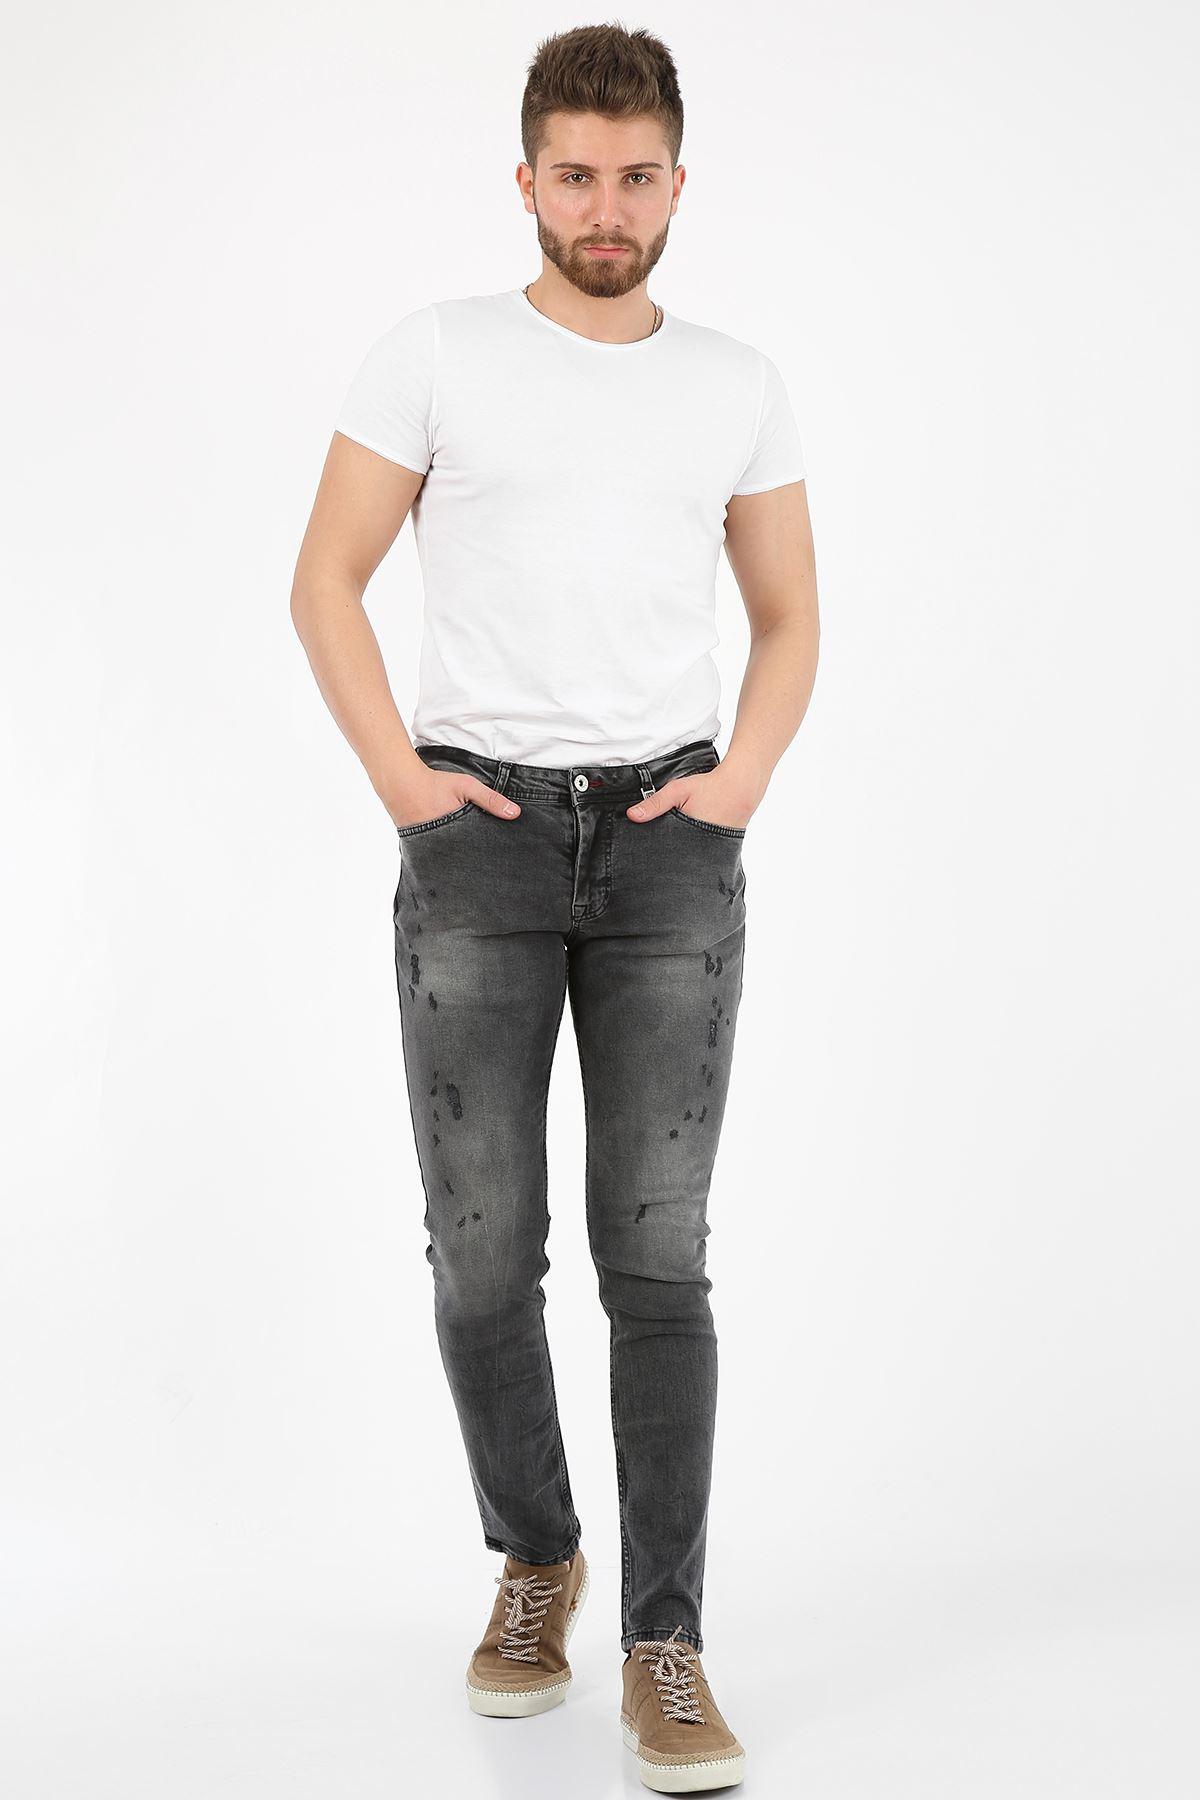 Antrasit Yıpratma Rodeo Slim Fit Fermuarlı Erkek Jeans Pantolon-JONAS